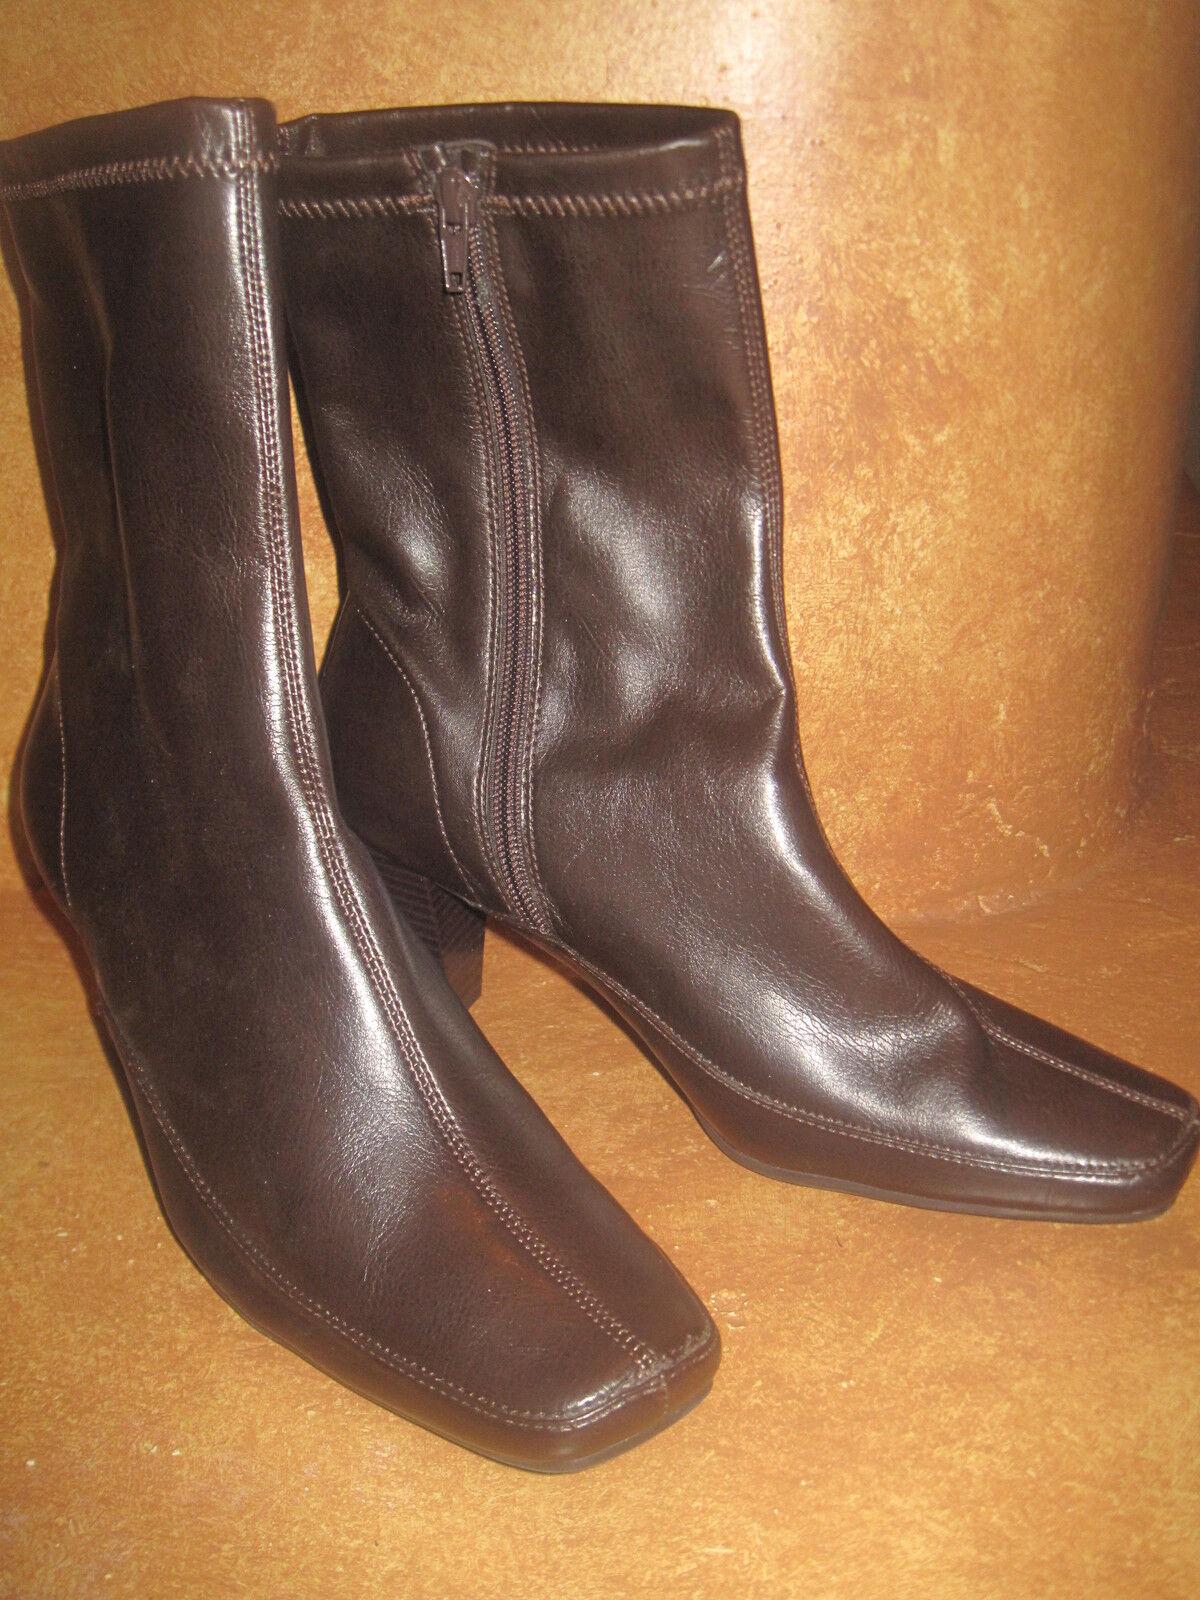 Aerology Women's Chocolate Brown Ankle Boots Zipper 2 3/4